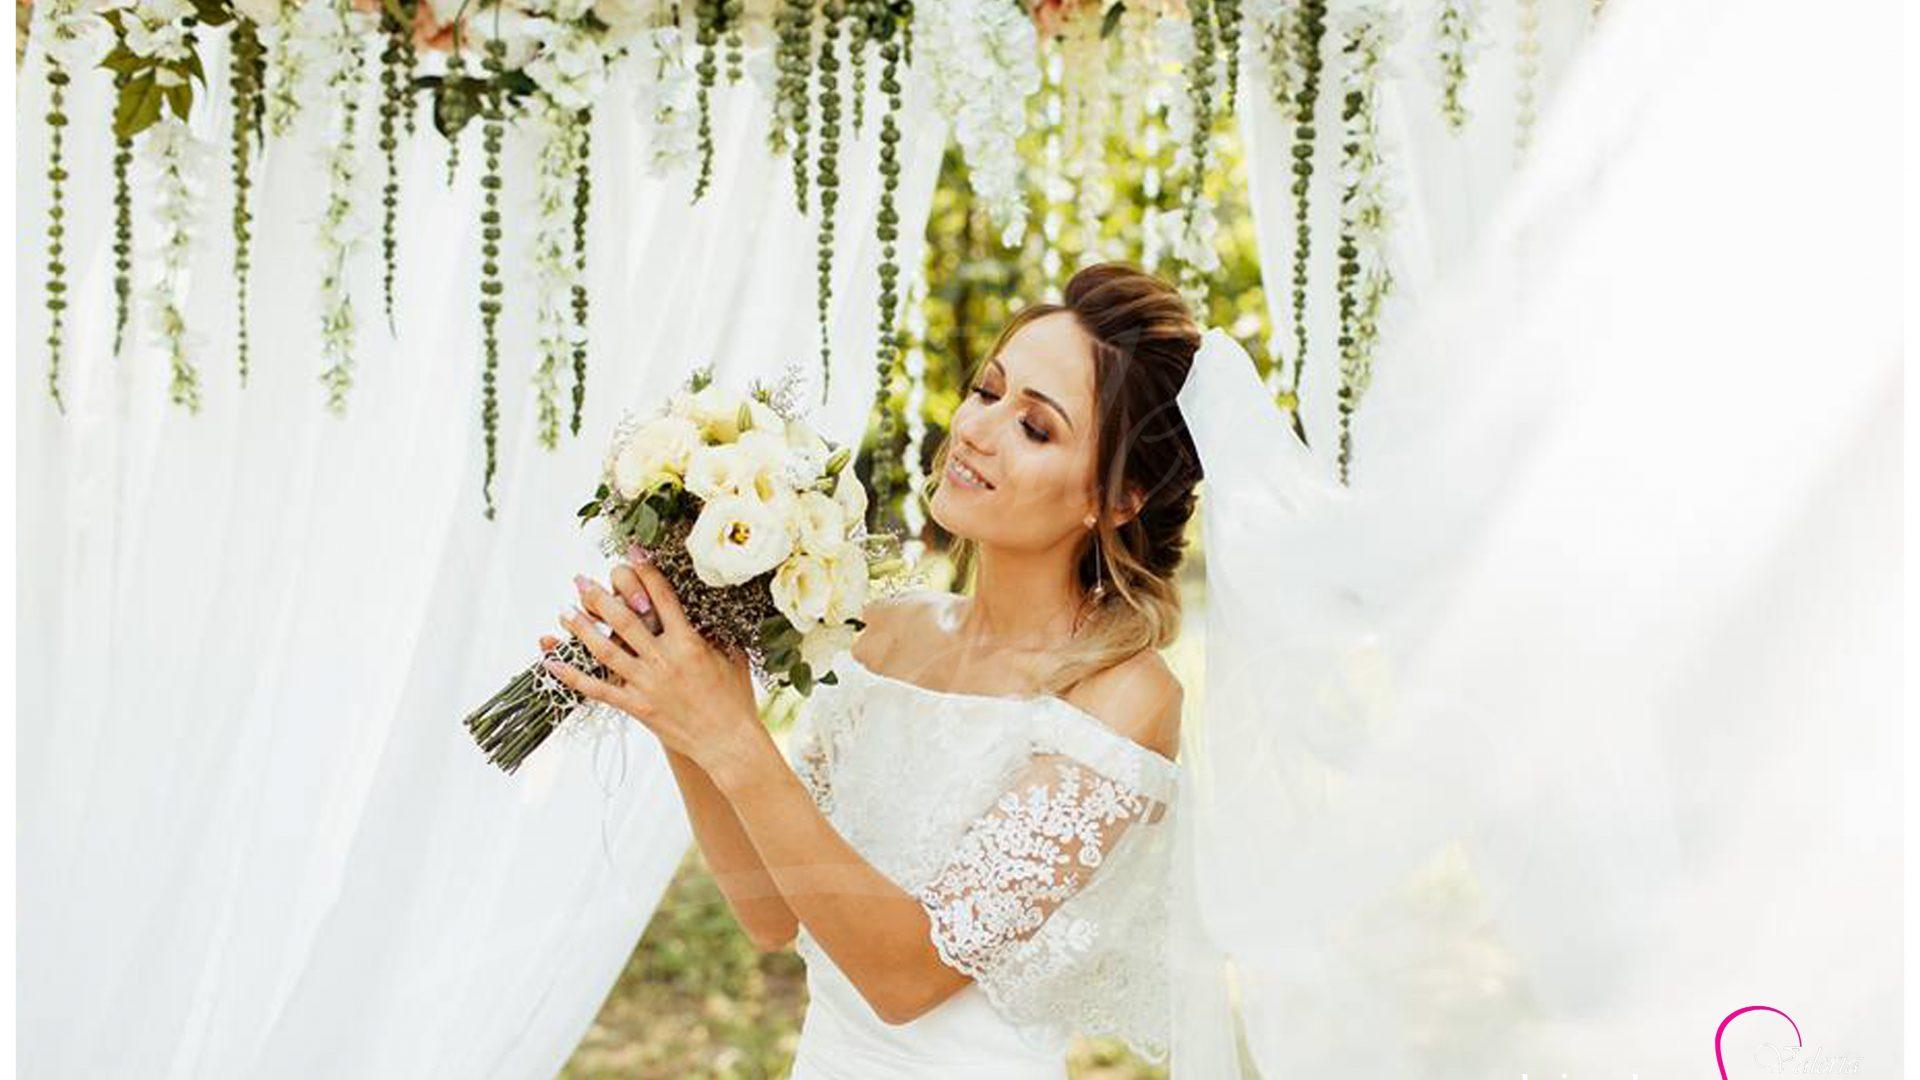 Inregistrarea casatoriei sub cerul liber Agentia Valeria Mariage 069787665 www.valeria (23)